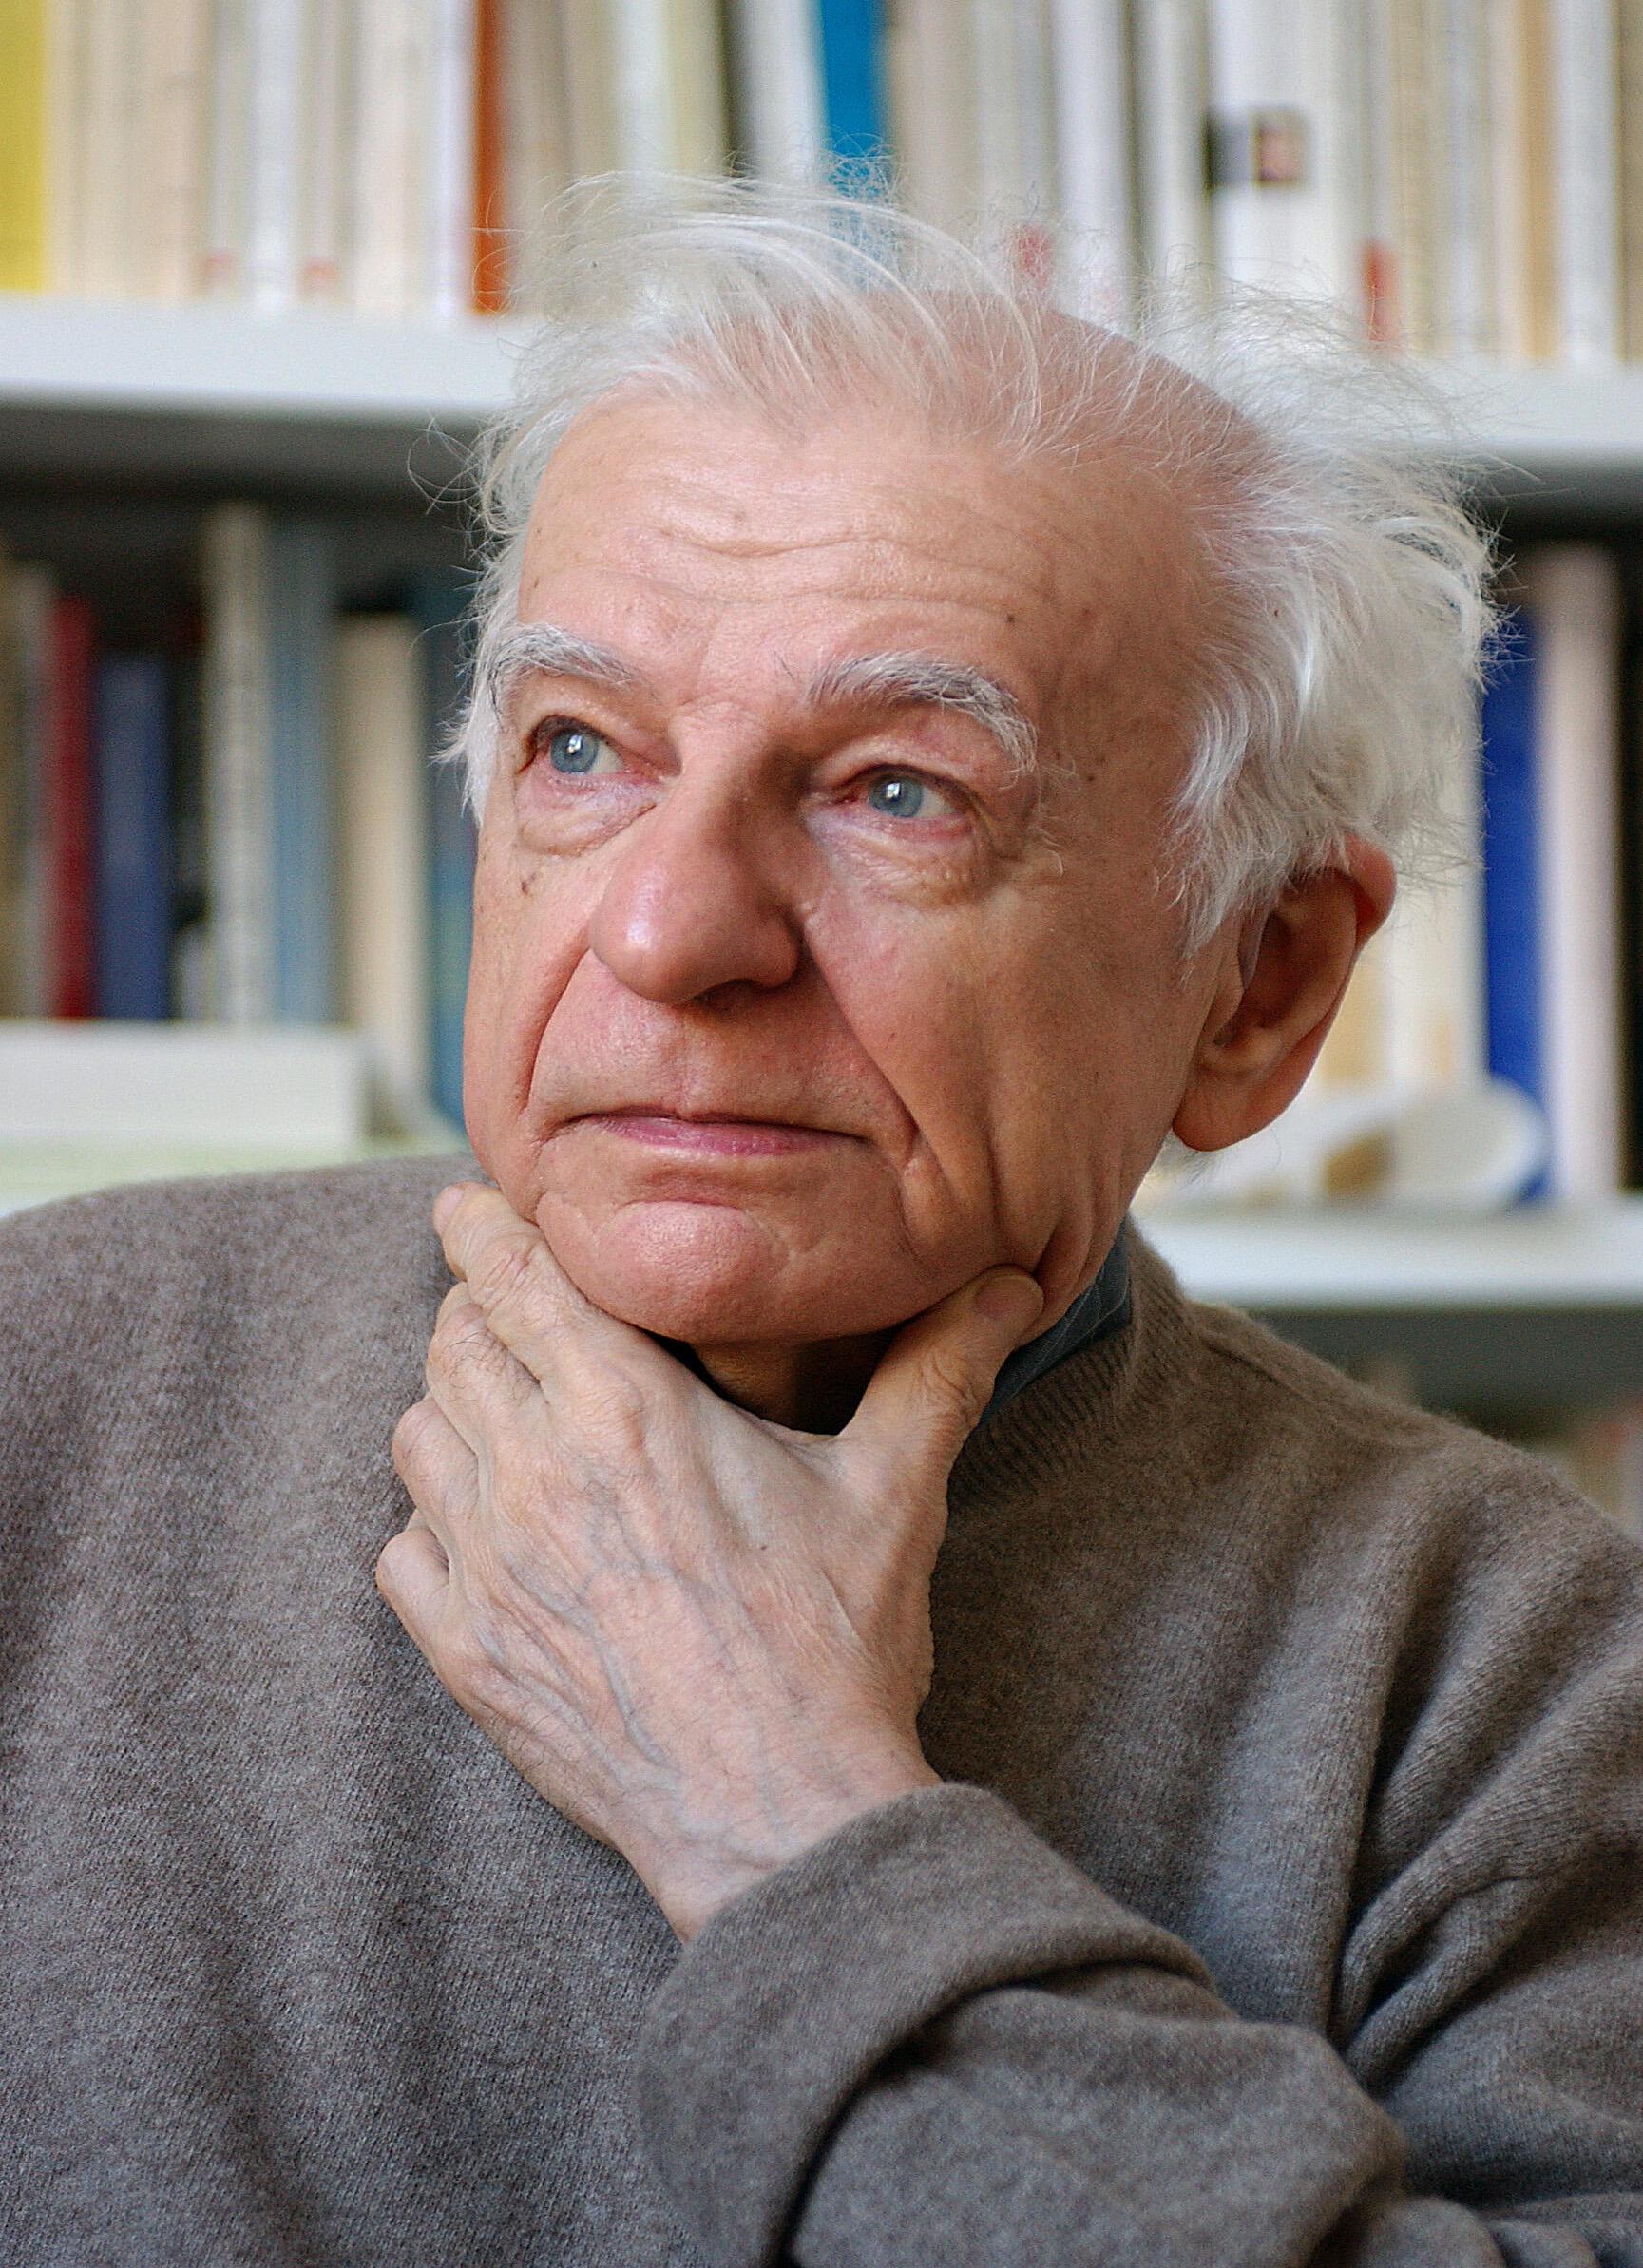 ایو بونفوا، شاعر فرانسوی